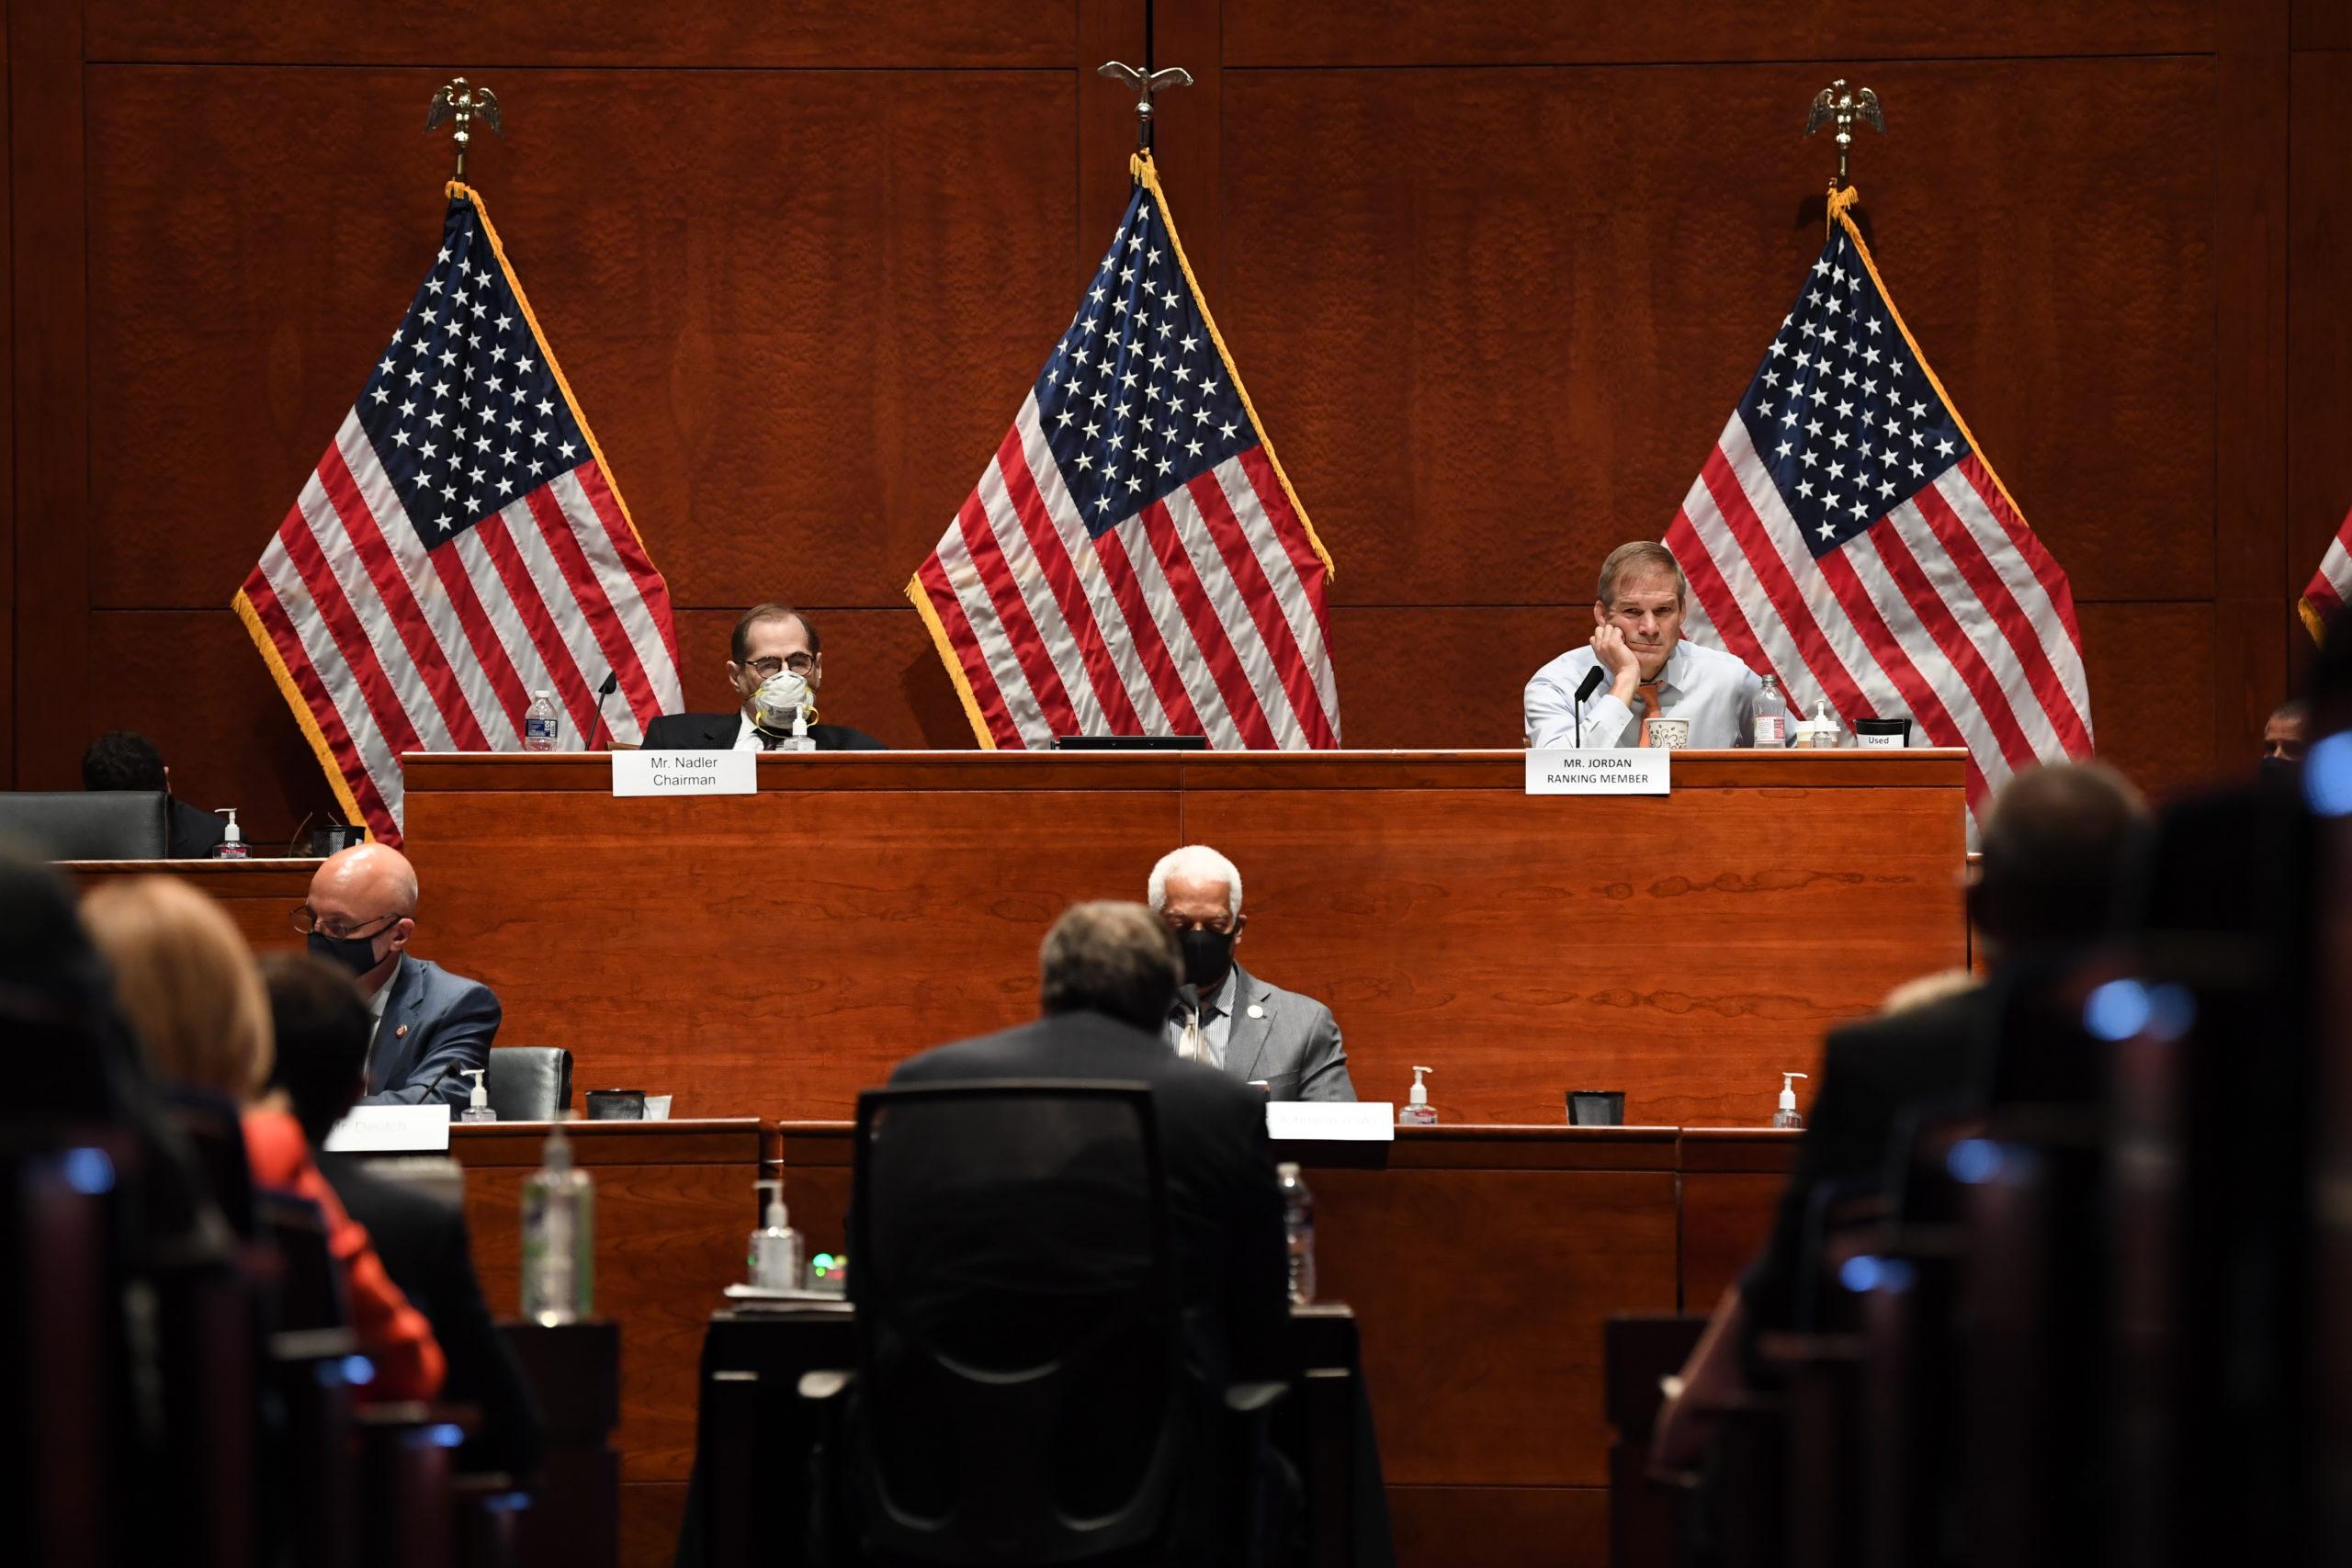 Reps. Jerrold Nadler and Jim Jordan listen during a hearing on July 28. (Matt McClain/Pool/Getty Images)